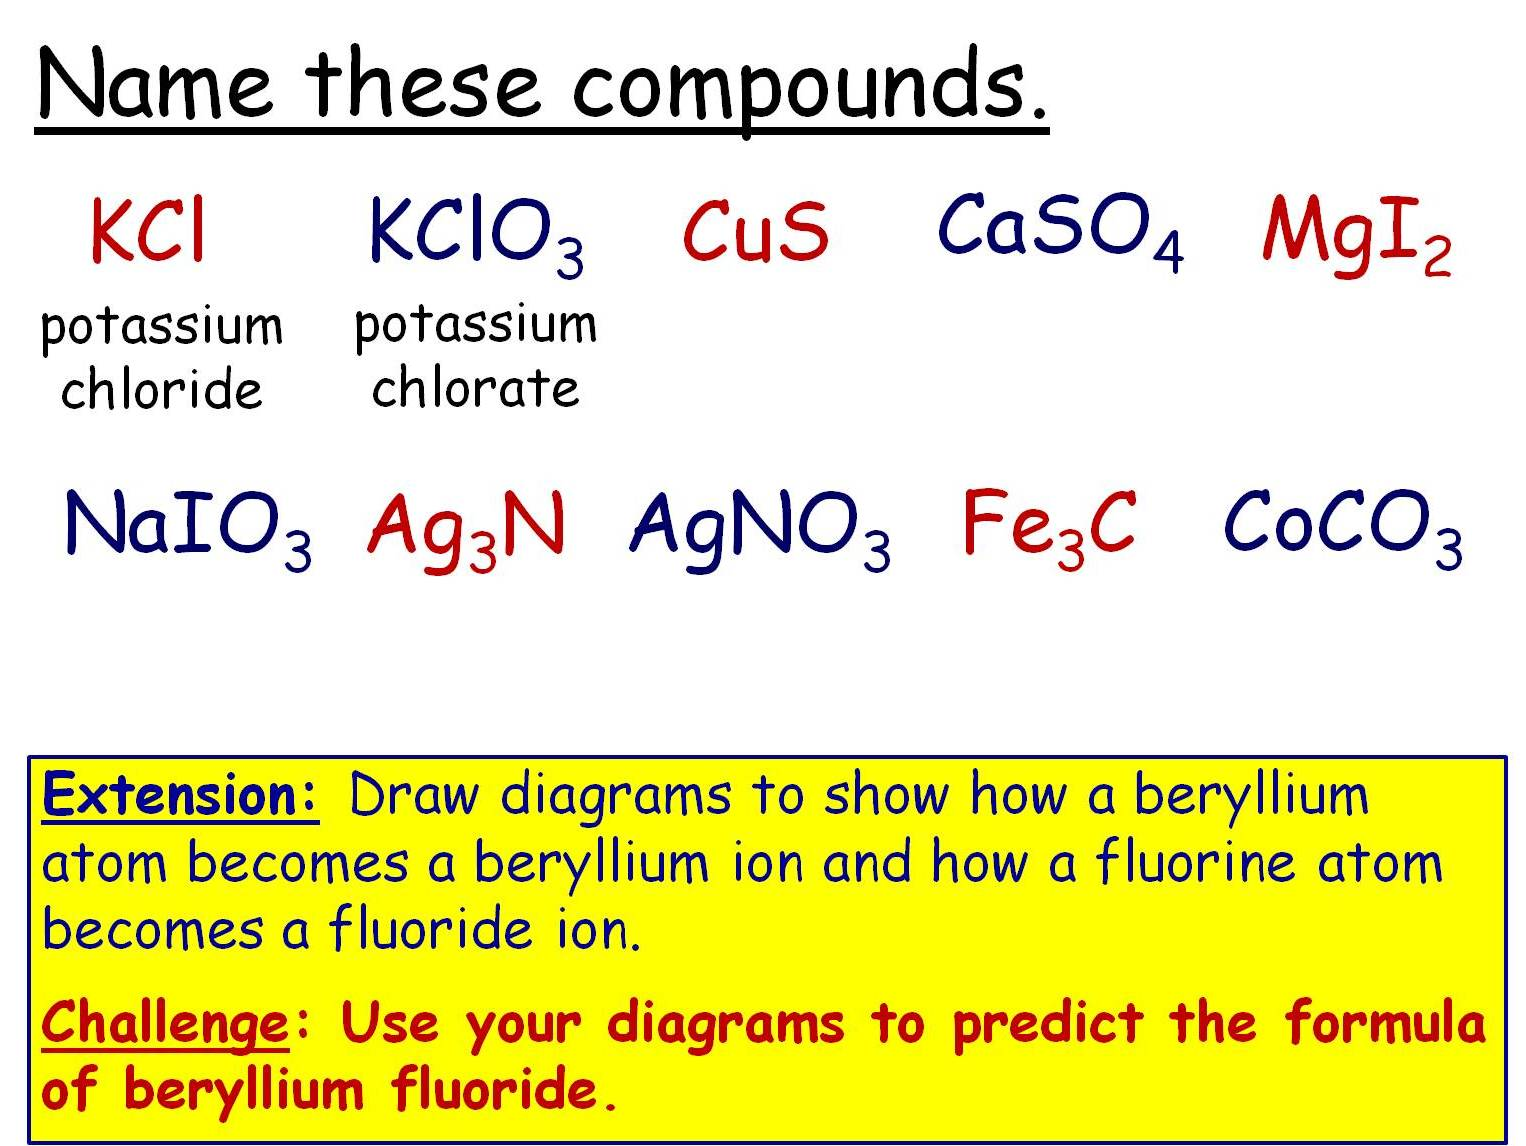 Ionic Bonding and Covalent Bonding: 4 GCSE Chemistry Lessons. Edexcel 9-1 Topics CC5 CC6 SC5 SC6